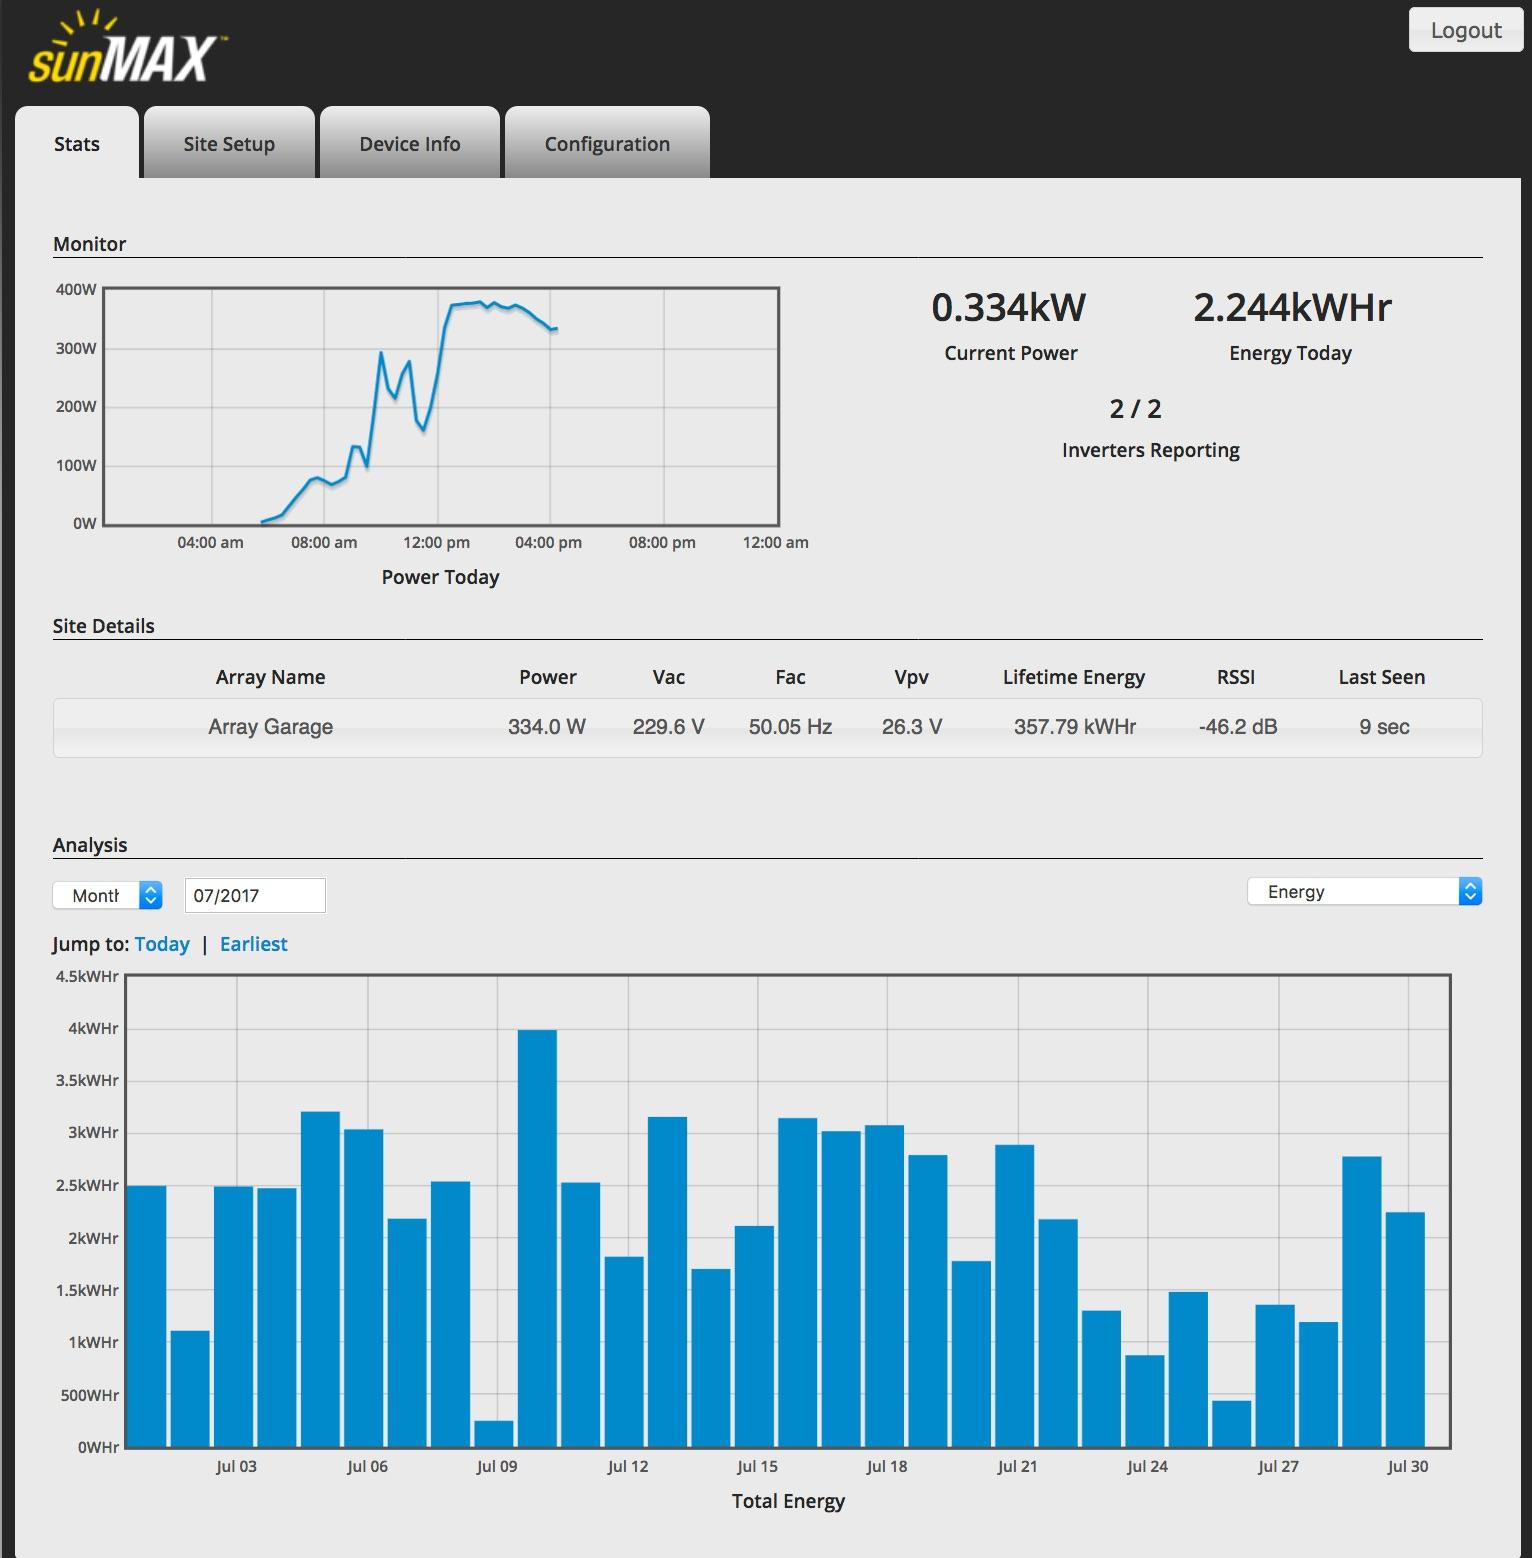 Sunmax Stats